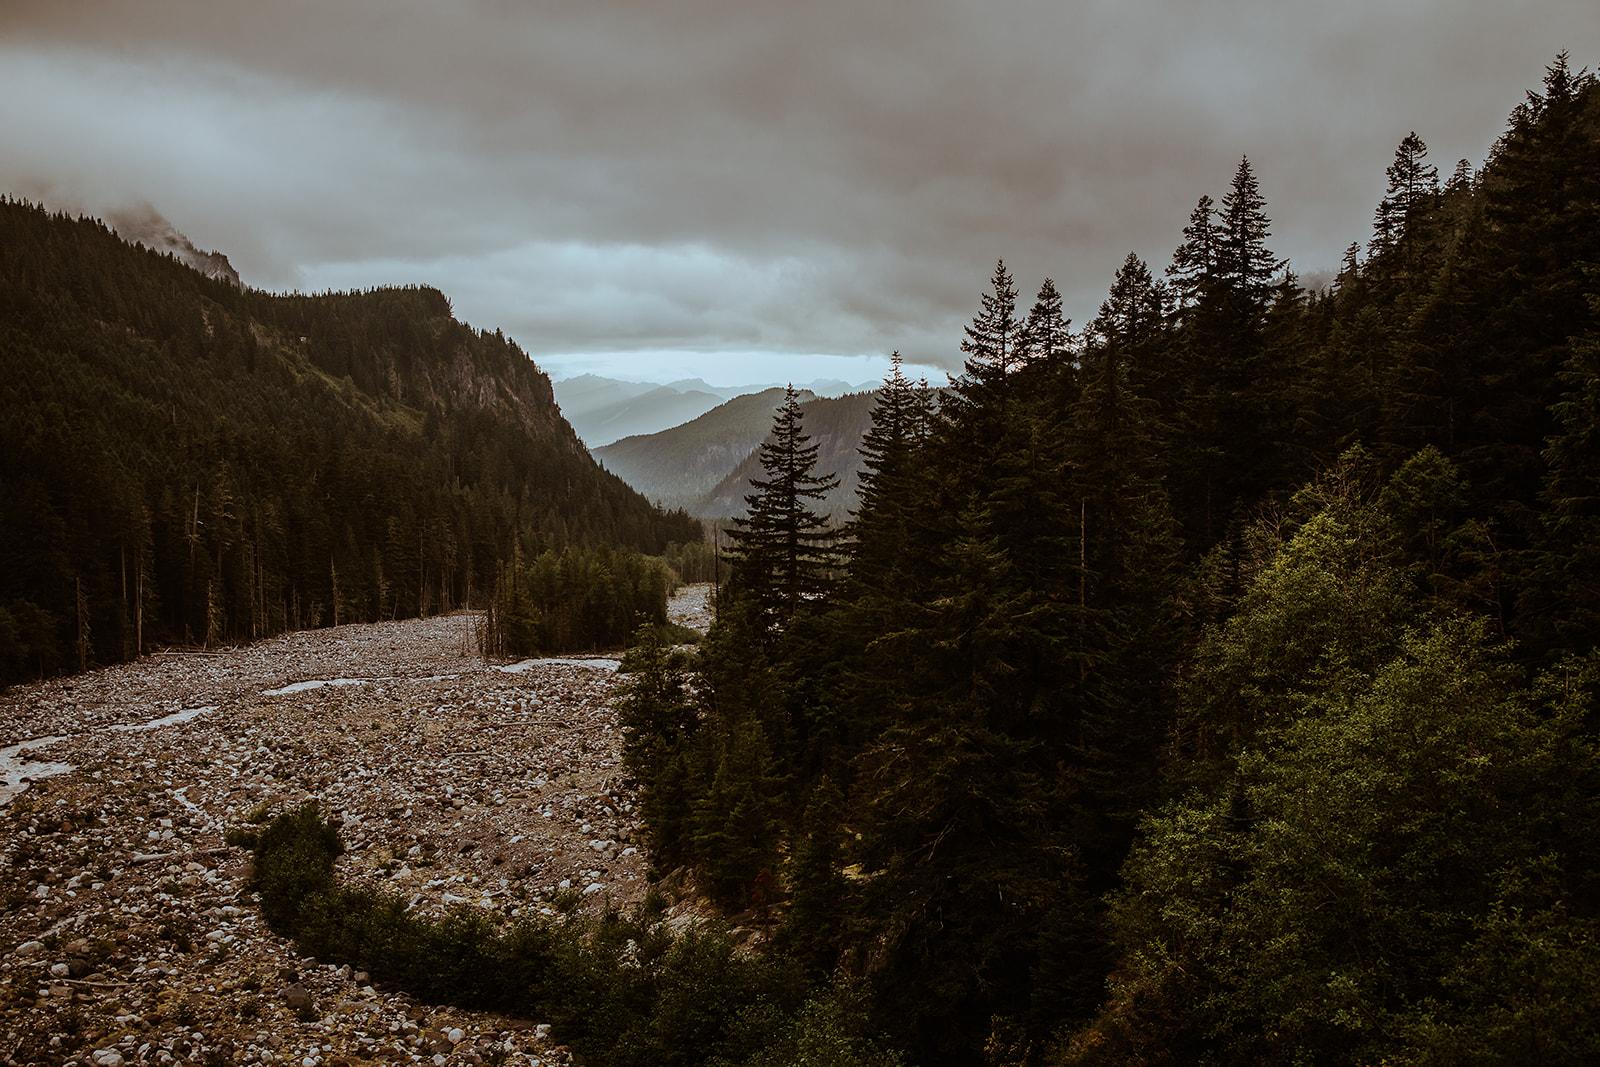 mount-rainier-cabin-elopement-megan-gallagher-photography_(470_of_568).jpg